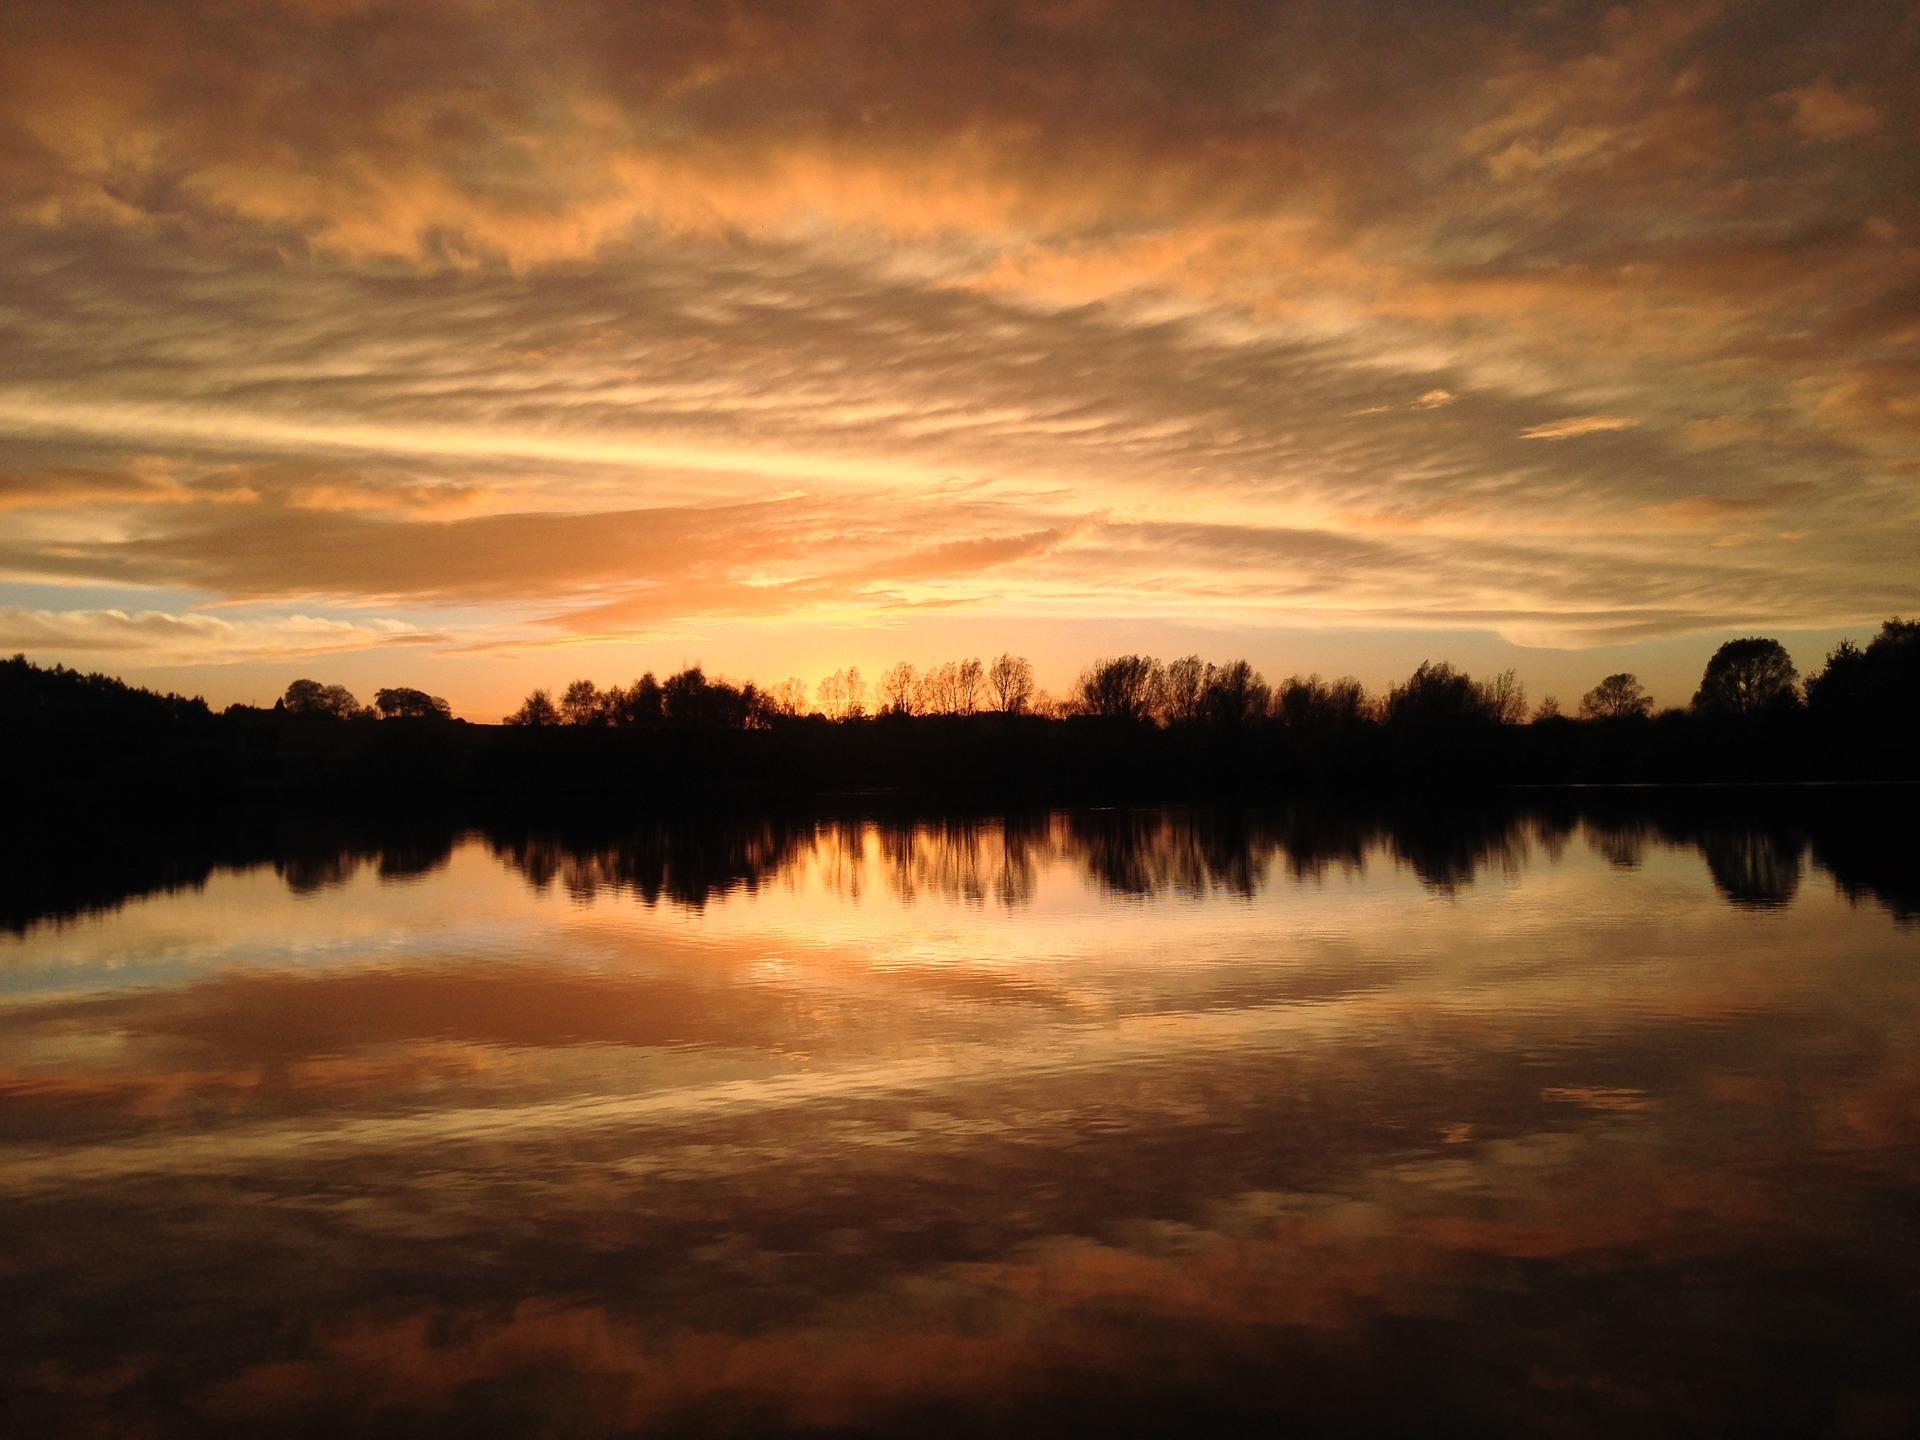 Norfolk Broads at sunset